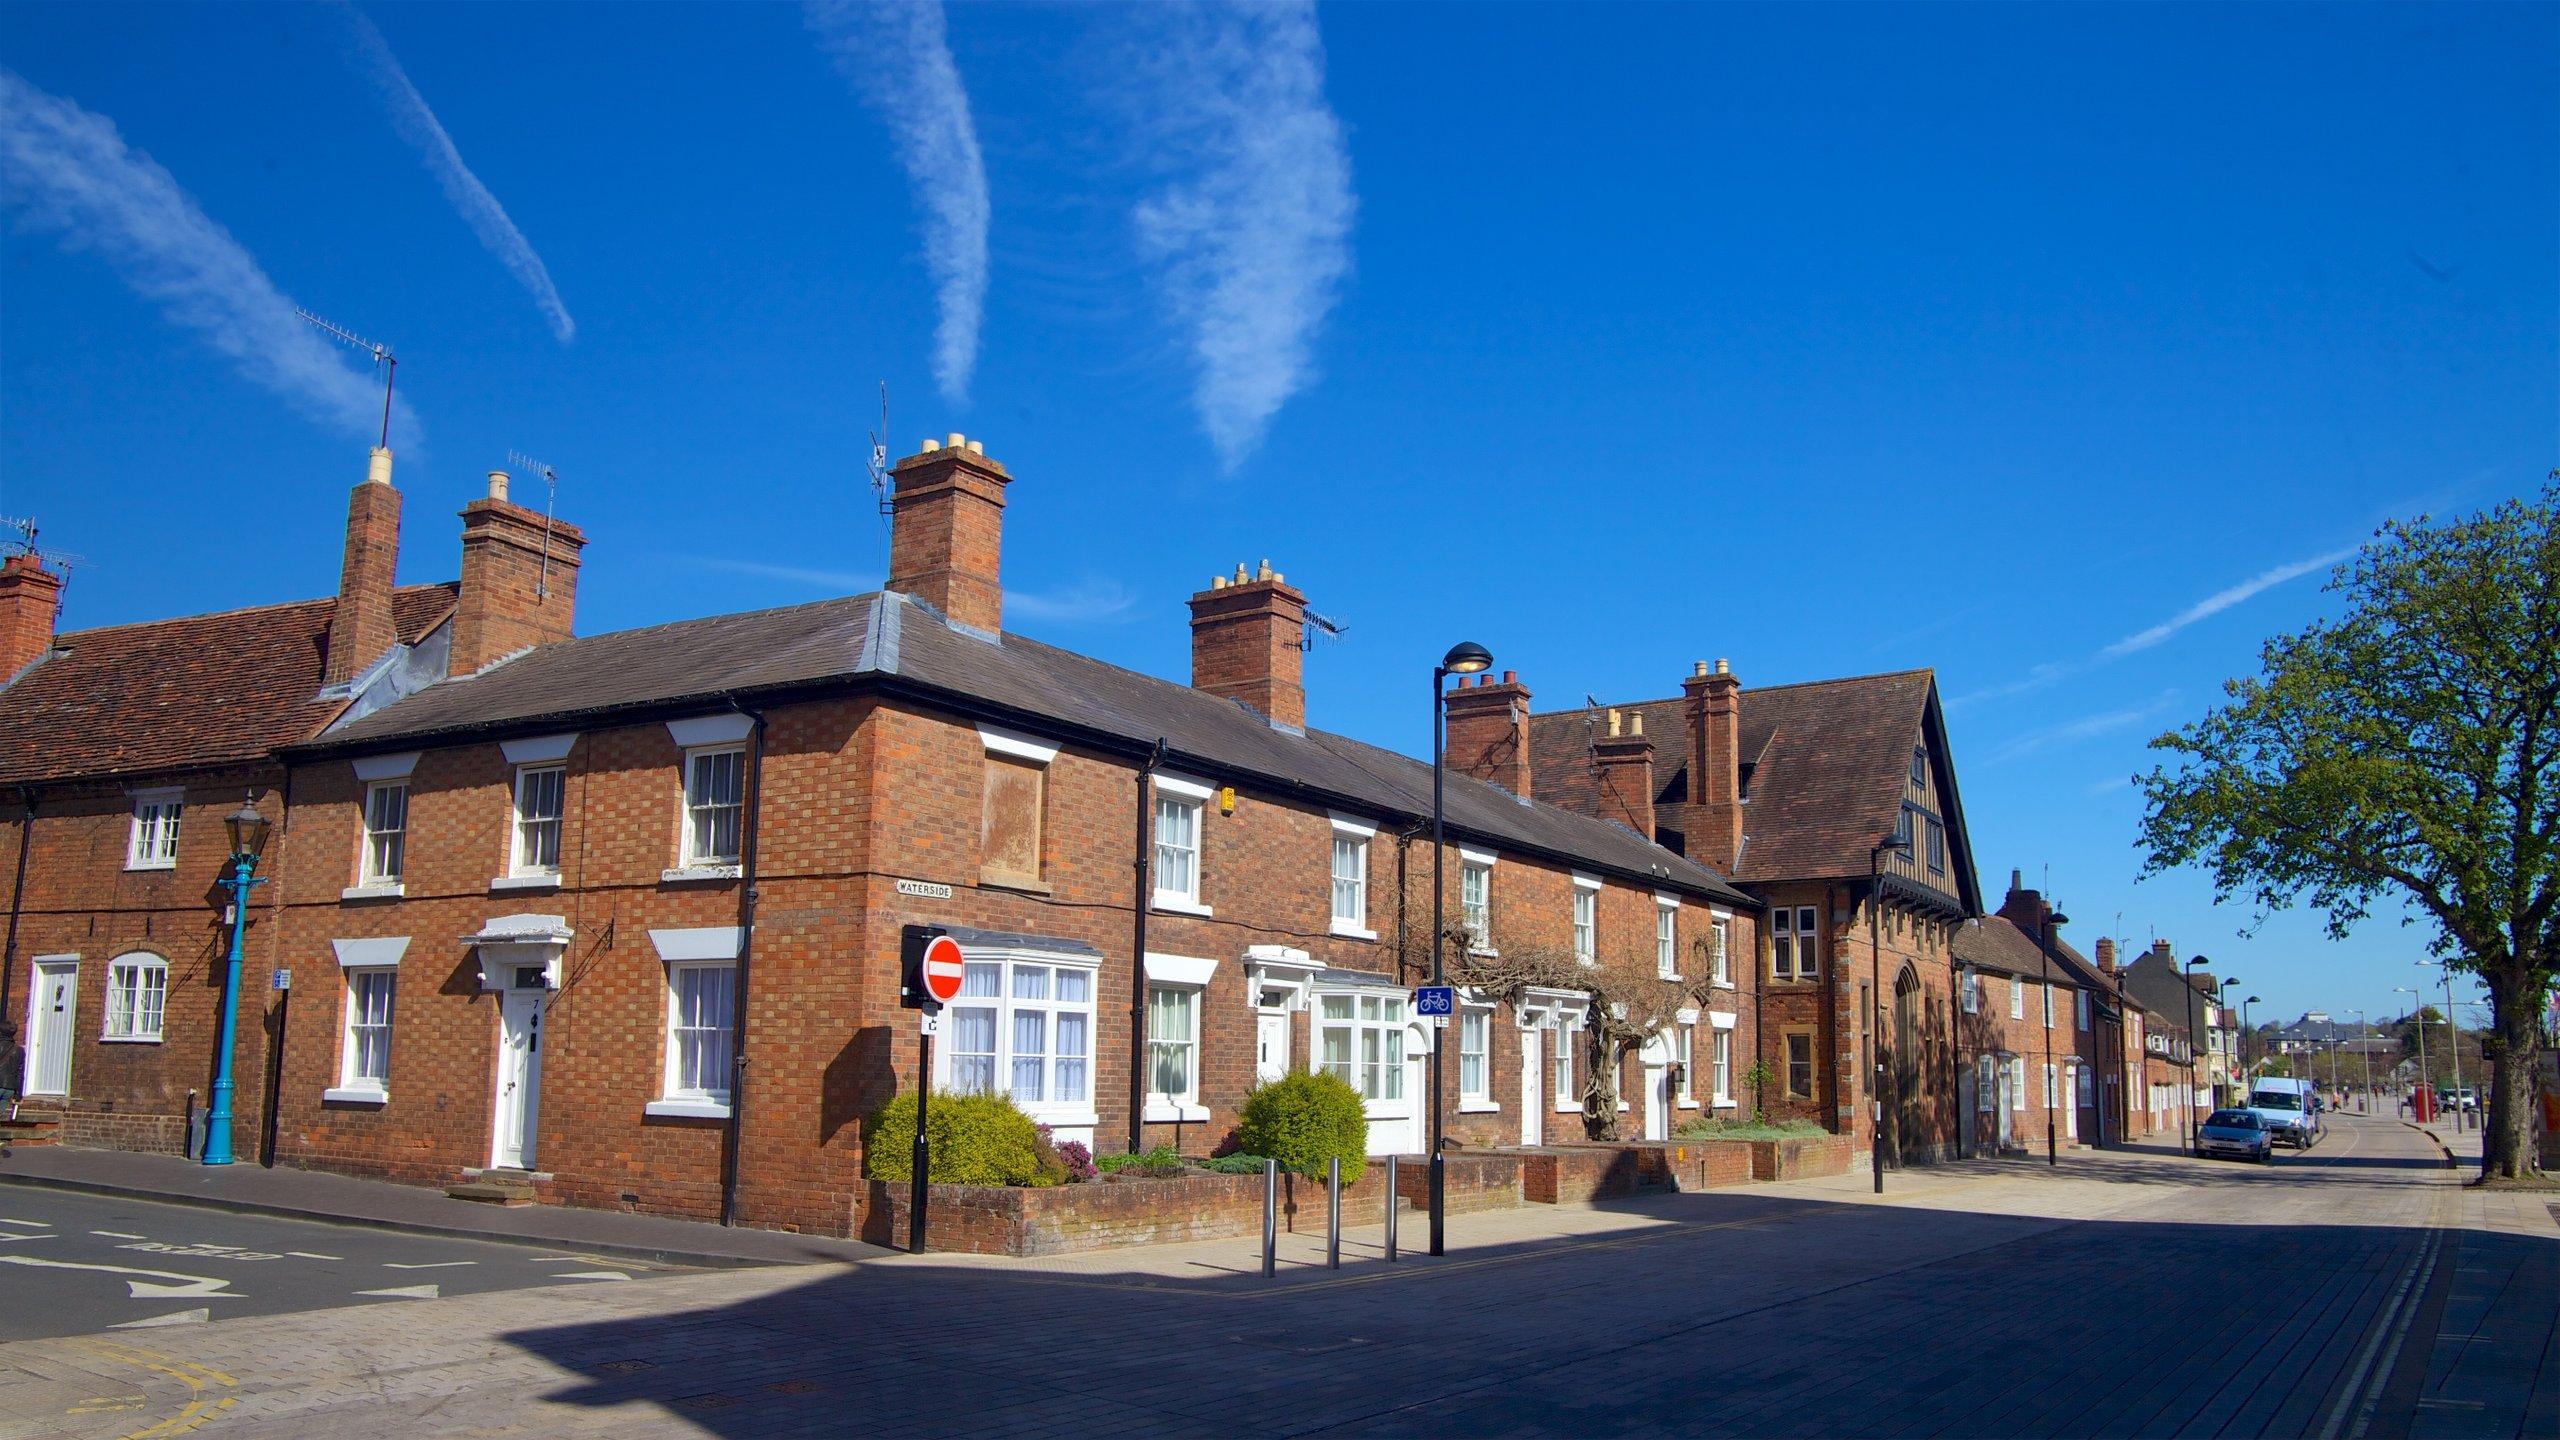 https://a.travel-assets.com/findyours-php/viewfinder/images/res70/207000/207835-Warwickshire.jpg